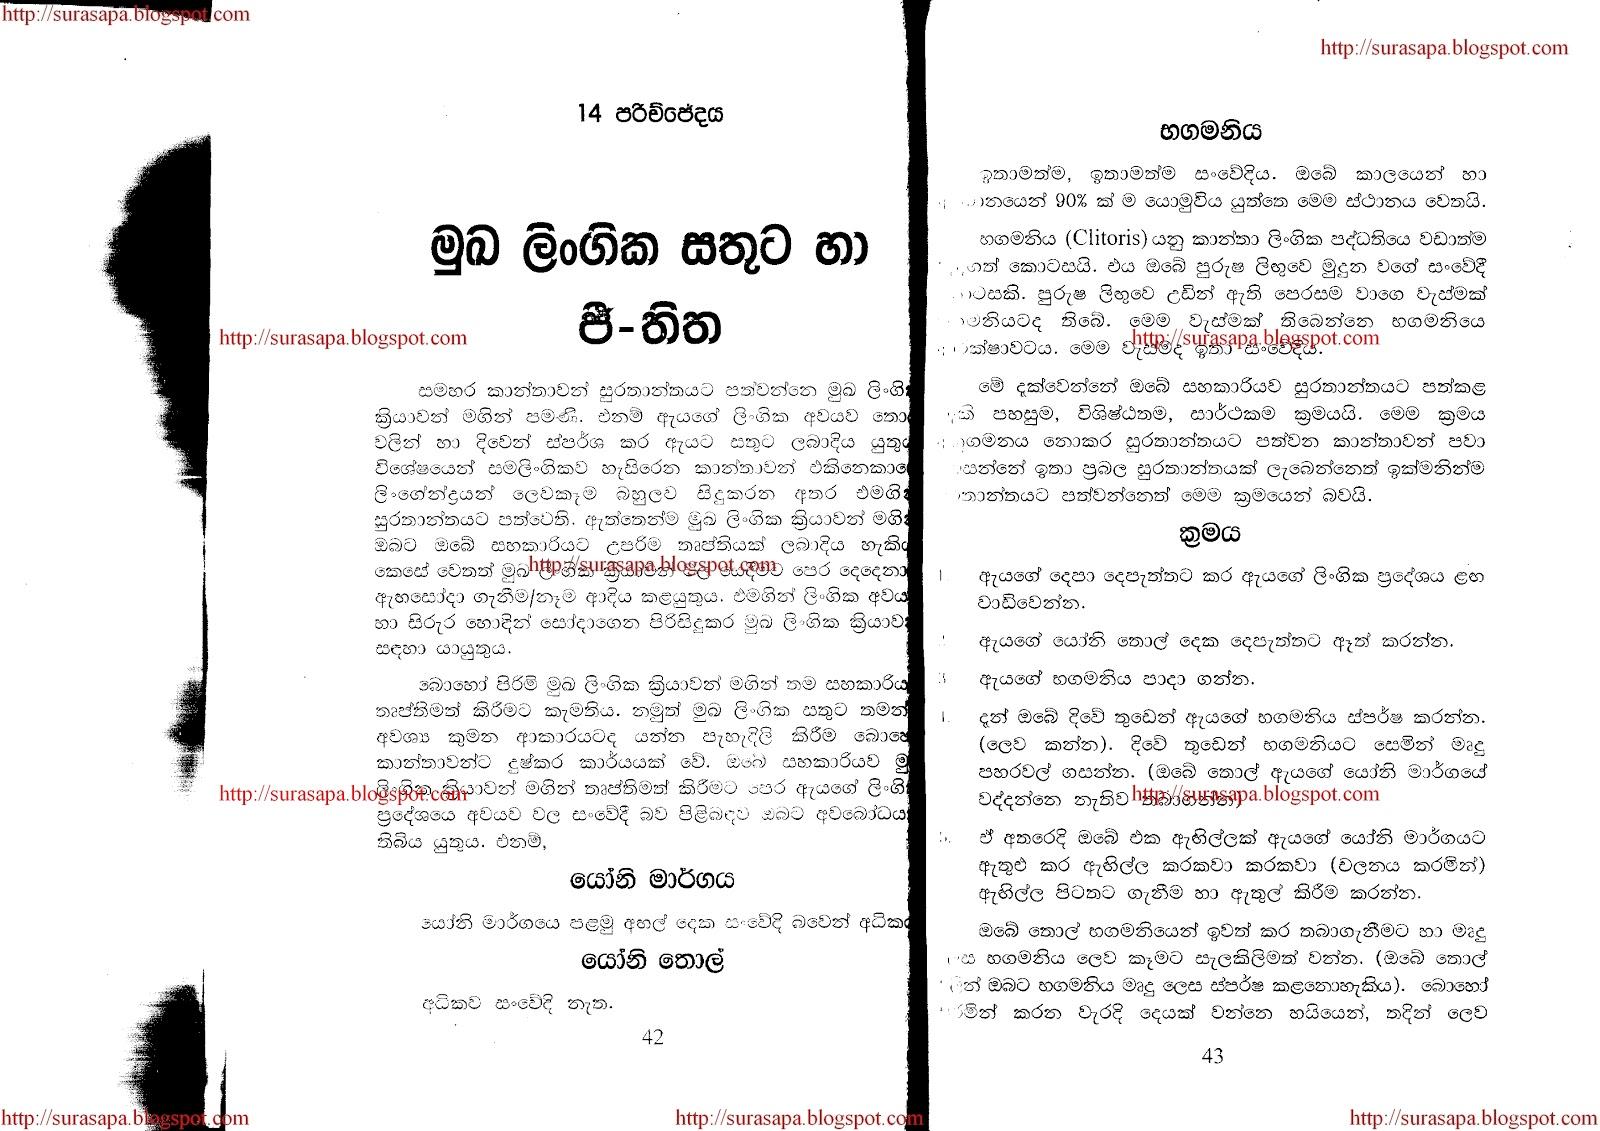 Hukana Sinhala Kello Hutta